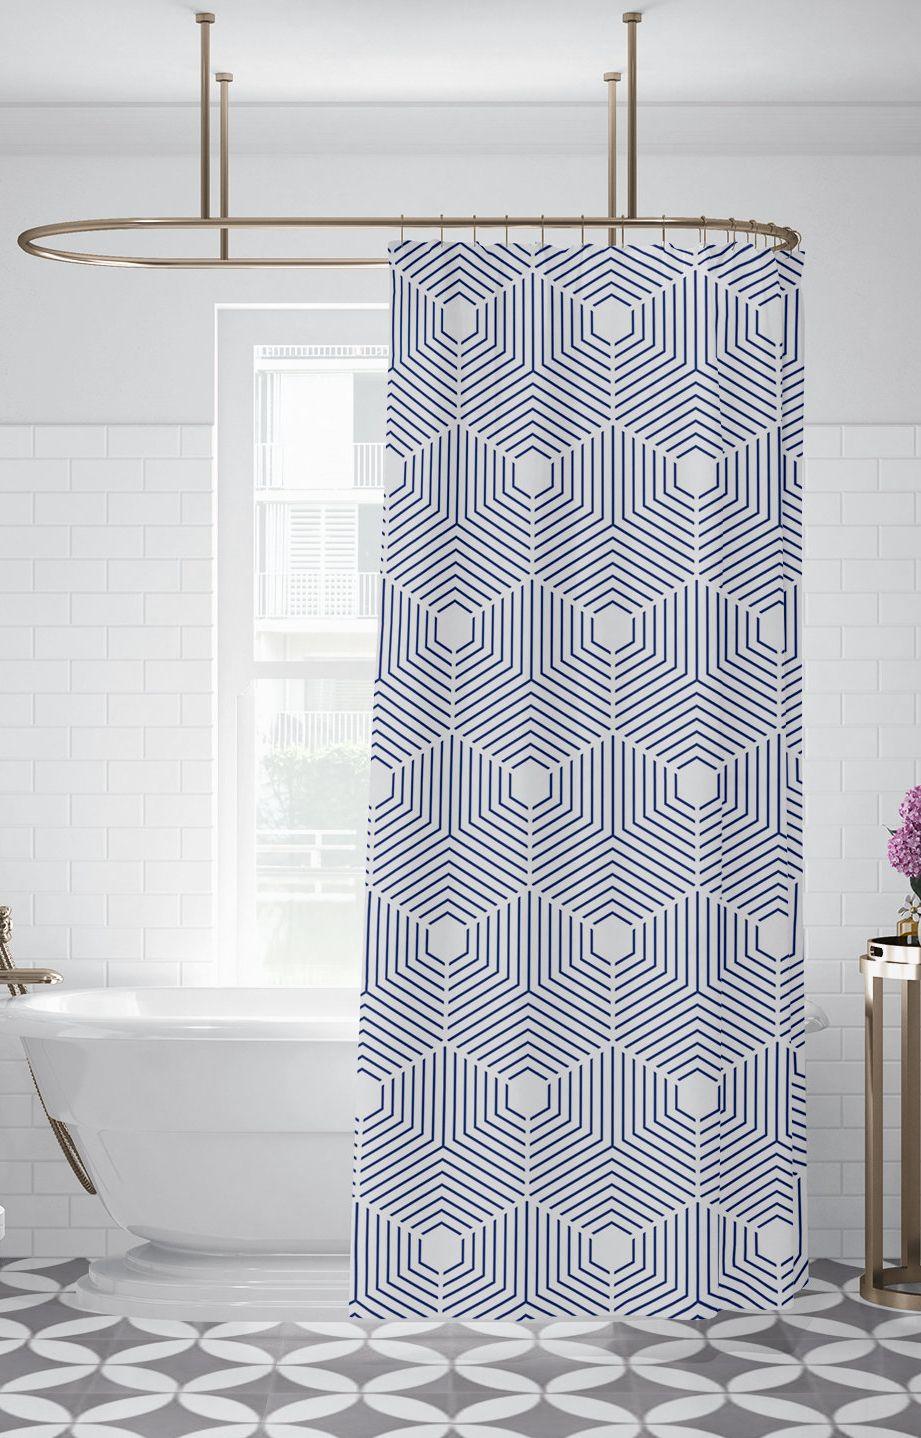 Indigo Geometric Pattern Shower Curtain Custom Printed Bath Curtain Fabric Shower Curtain Indigo Blue Shower Curtain Machine Washable Fabric Shower Curtains Patterned Shower Curtain Blue Shower Curtains